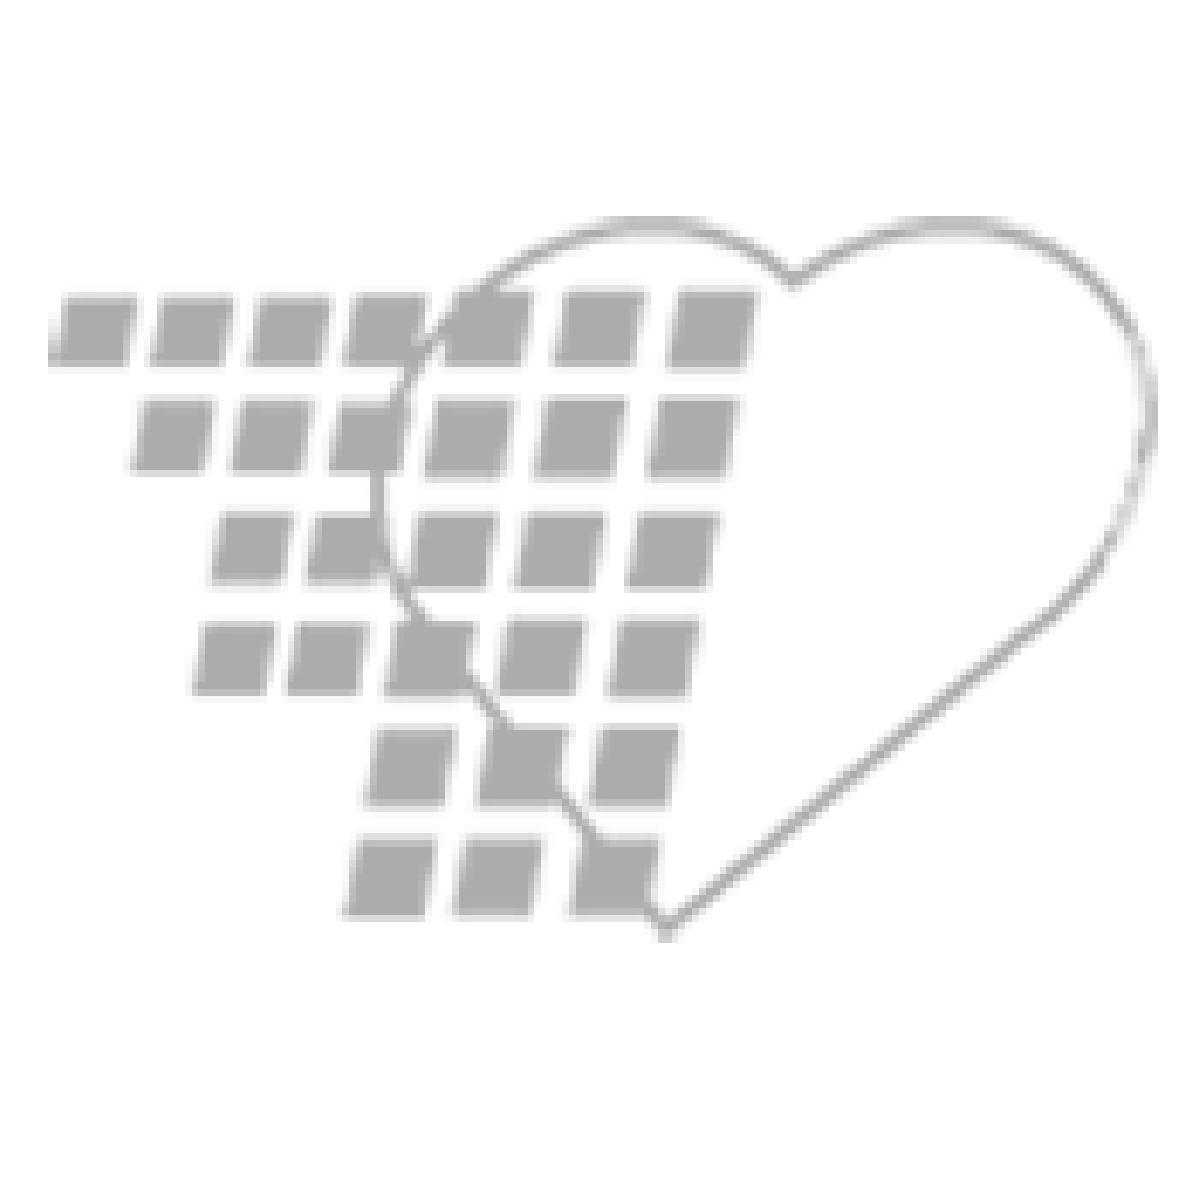 06-93-3122 - Demo Dose® Dantrolen Sodim (Ryanodx) 250 mg (50mg/mL)